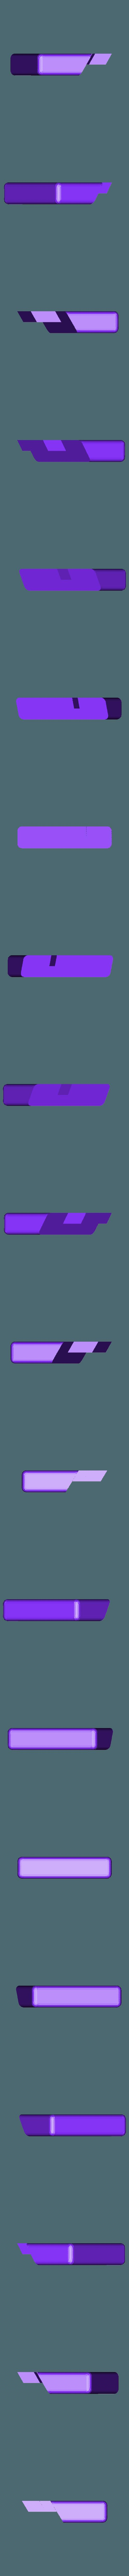 male.stl Download free STL file Belt buckle • 3D printable template, volpiclaudio